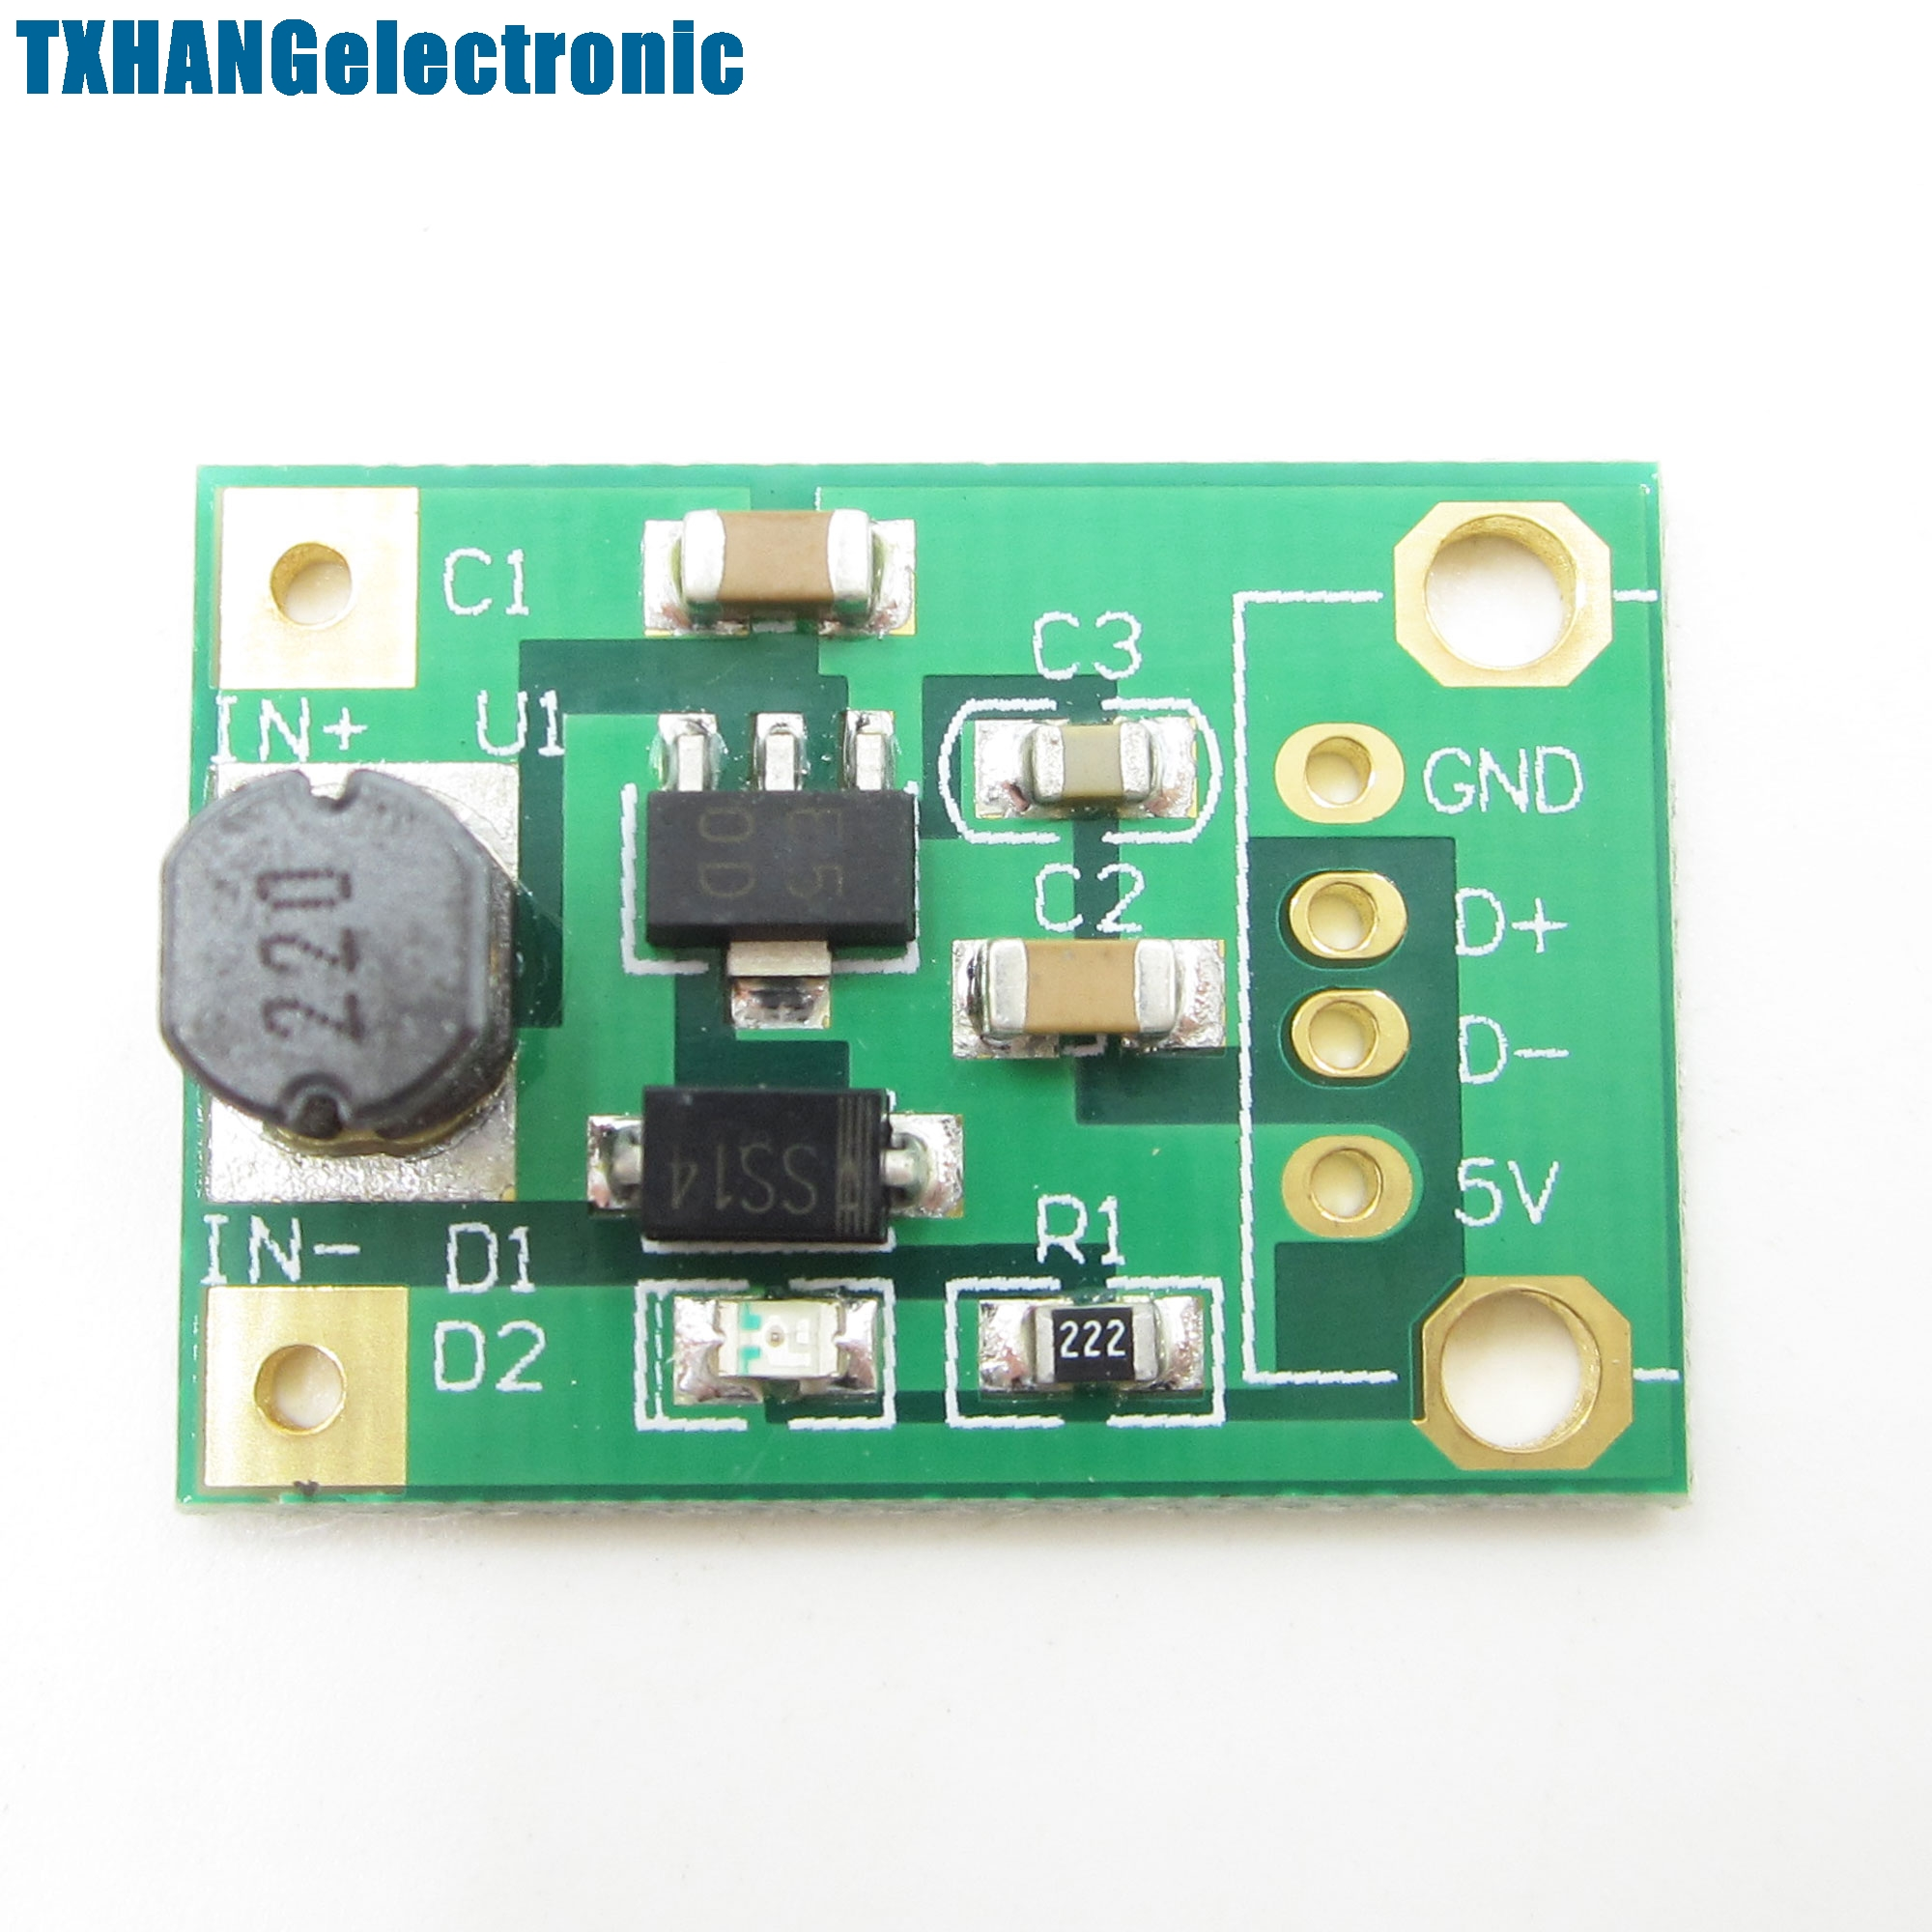 2PCS DC-DC Boost Konverter Step Up Modul 1-5V to 5V 500mA für Arduino